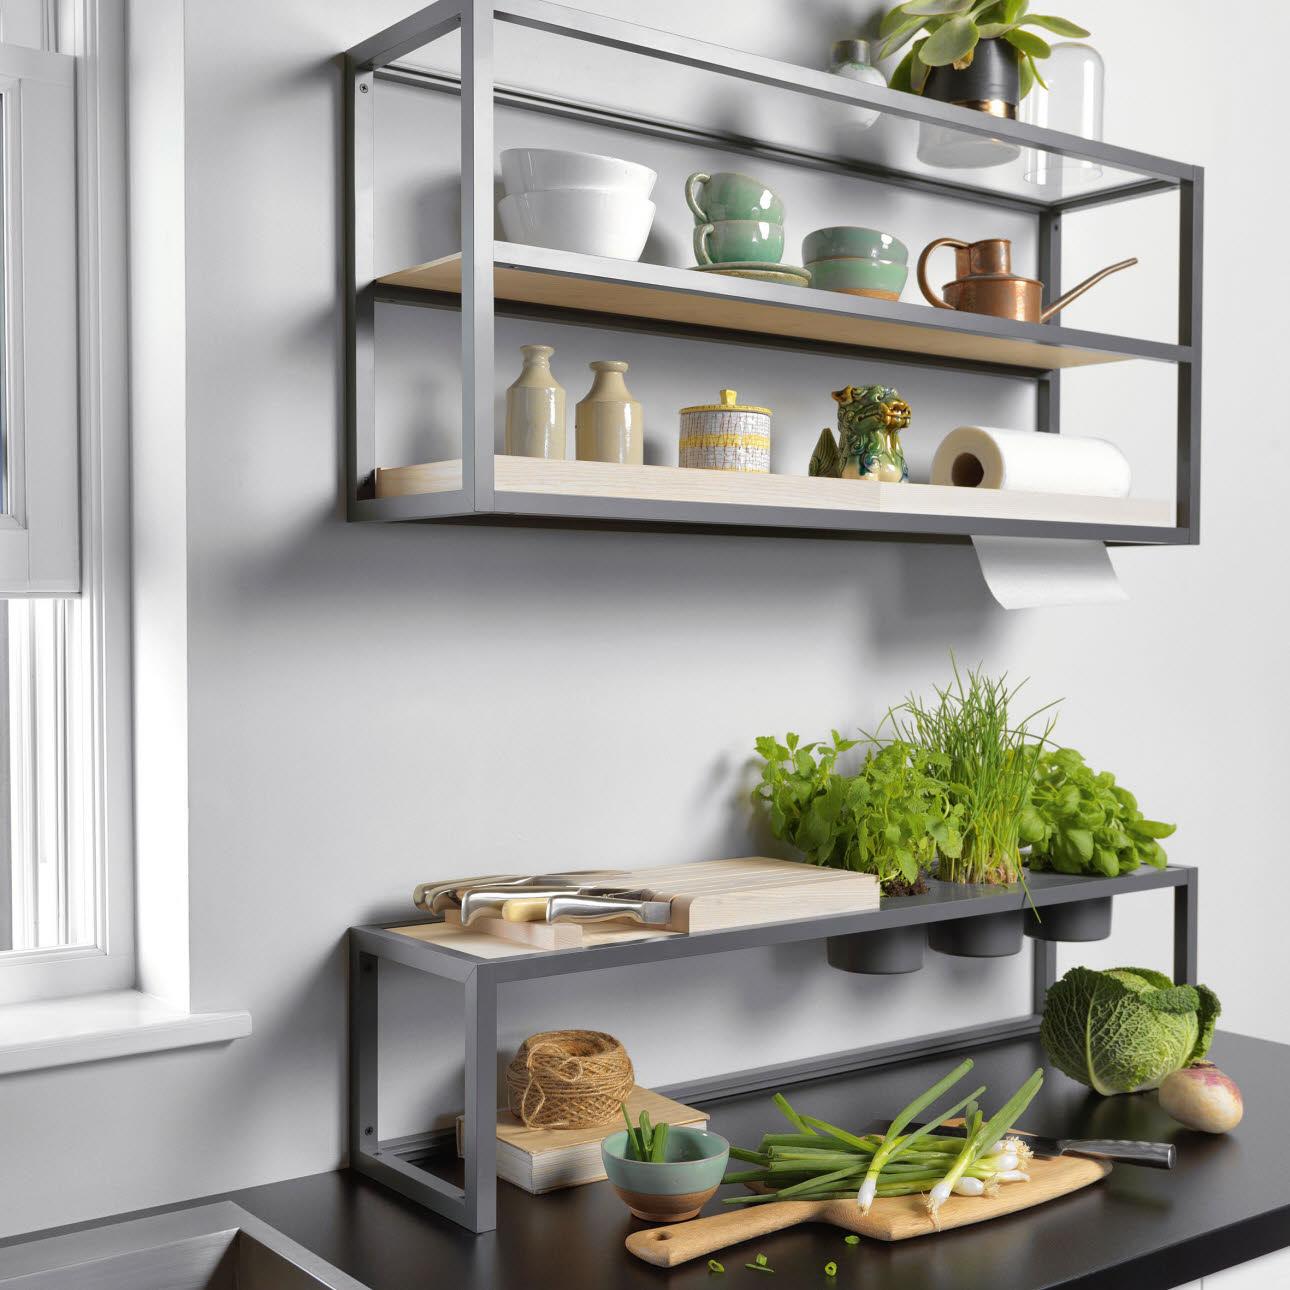 lebensmittellagerung in der k che. Black Bedroom Furniture Sets. Home Design Ideas